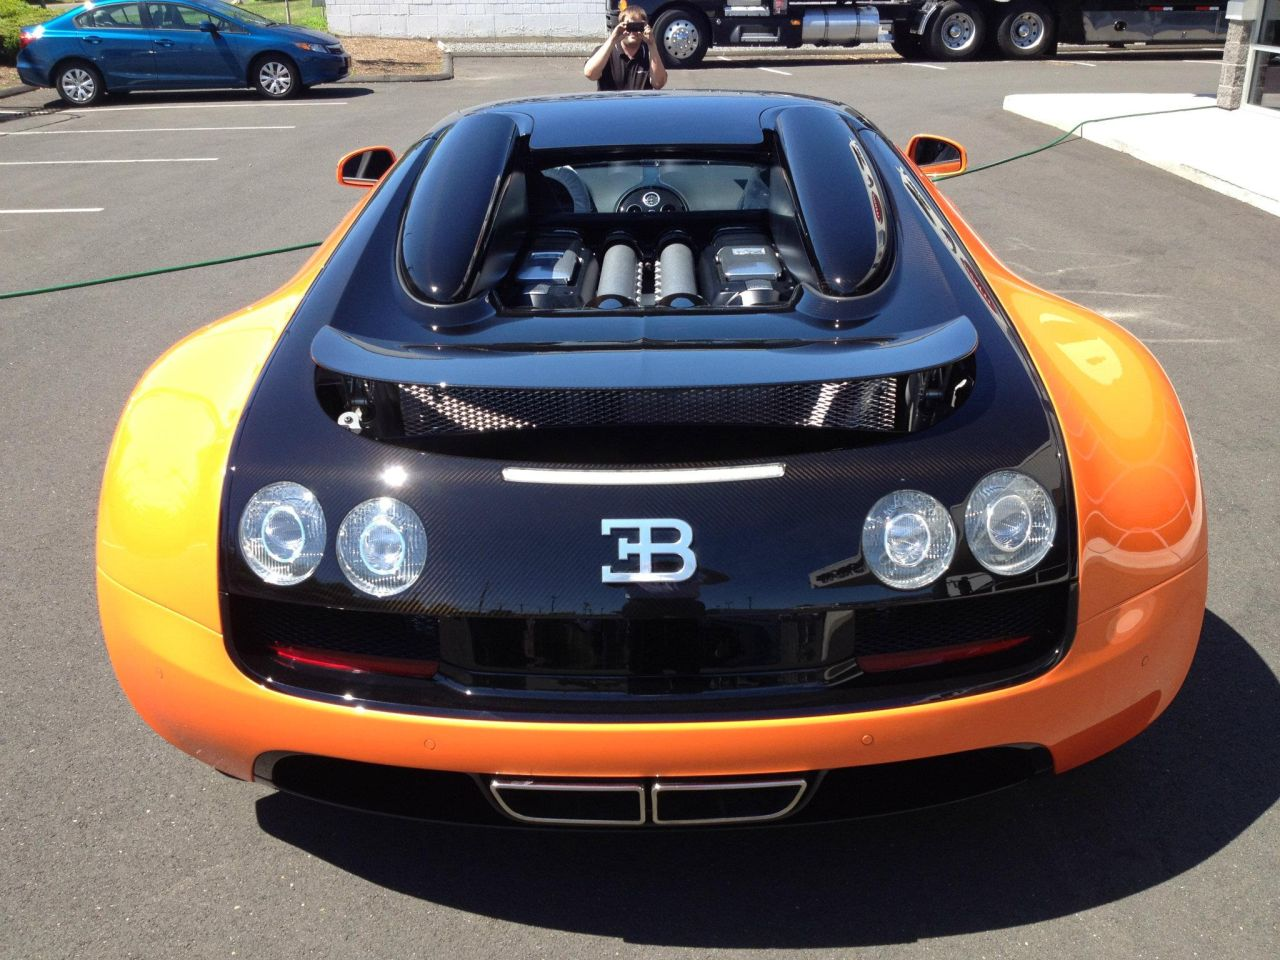 Bugatti-Veyron-Grand-Sport-Vitesse-oranje-01.jpg